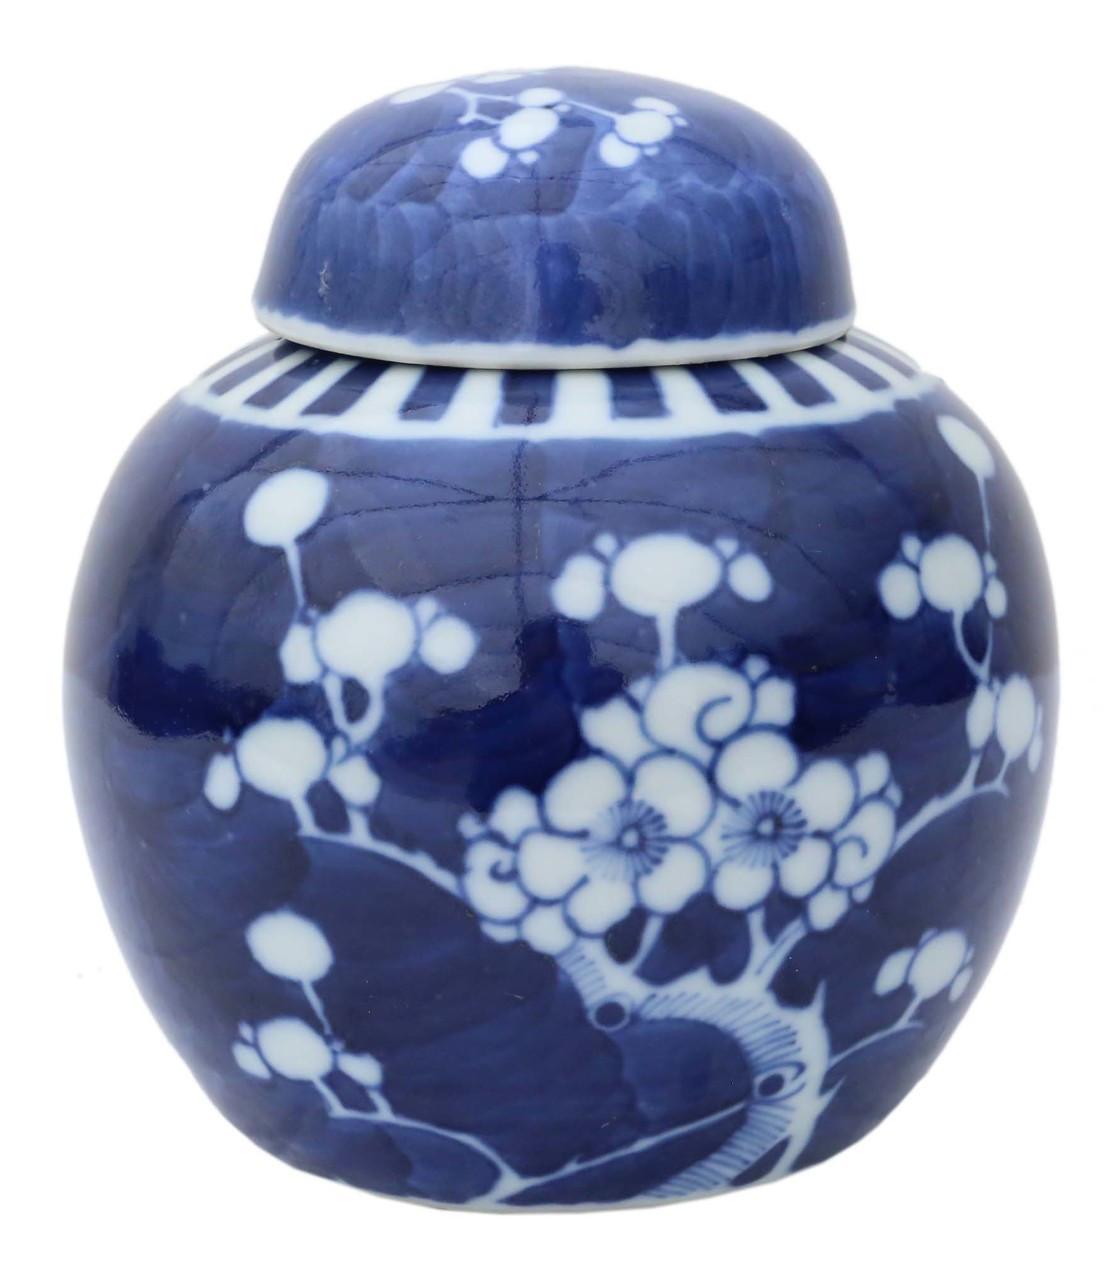 Antique Blue White Oriental Chinese Ceramic Ginger Jar With Lid Prior Willis Antiques